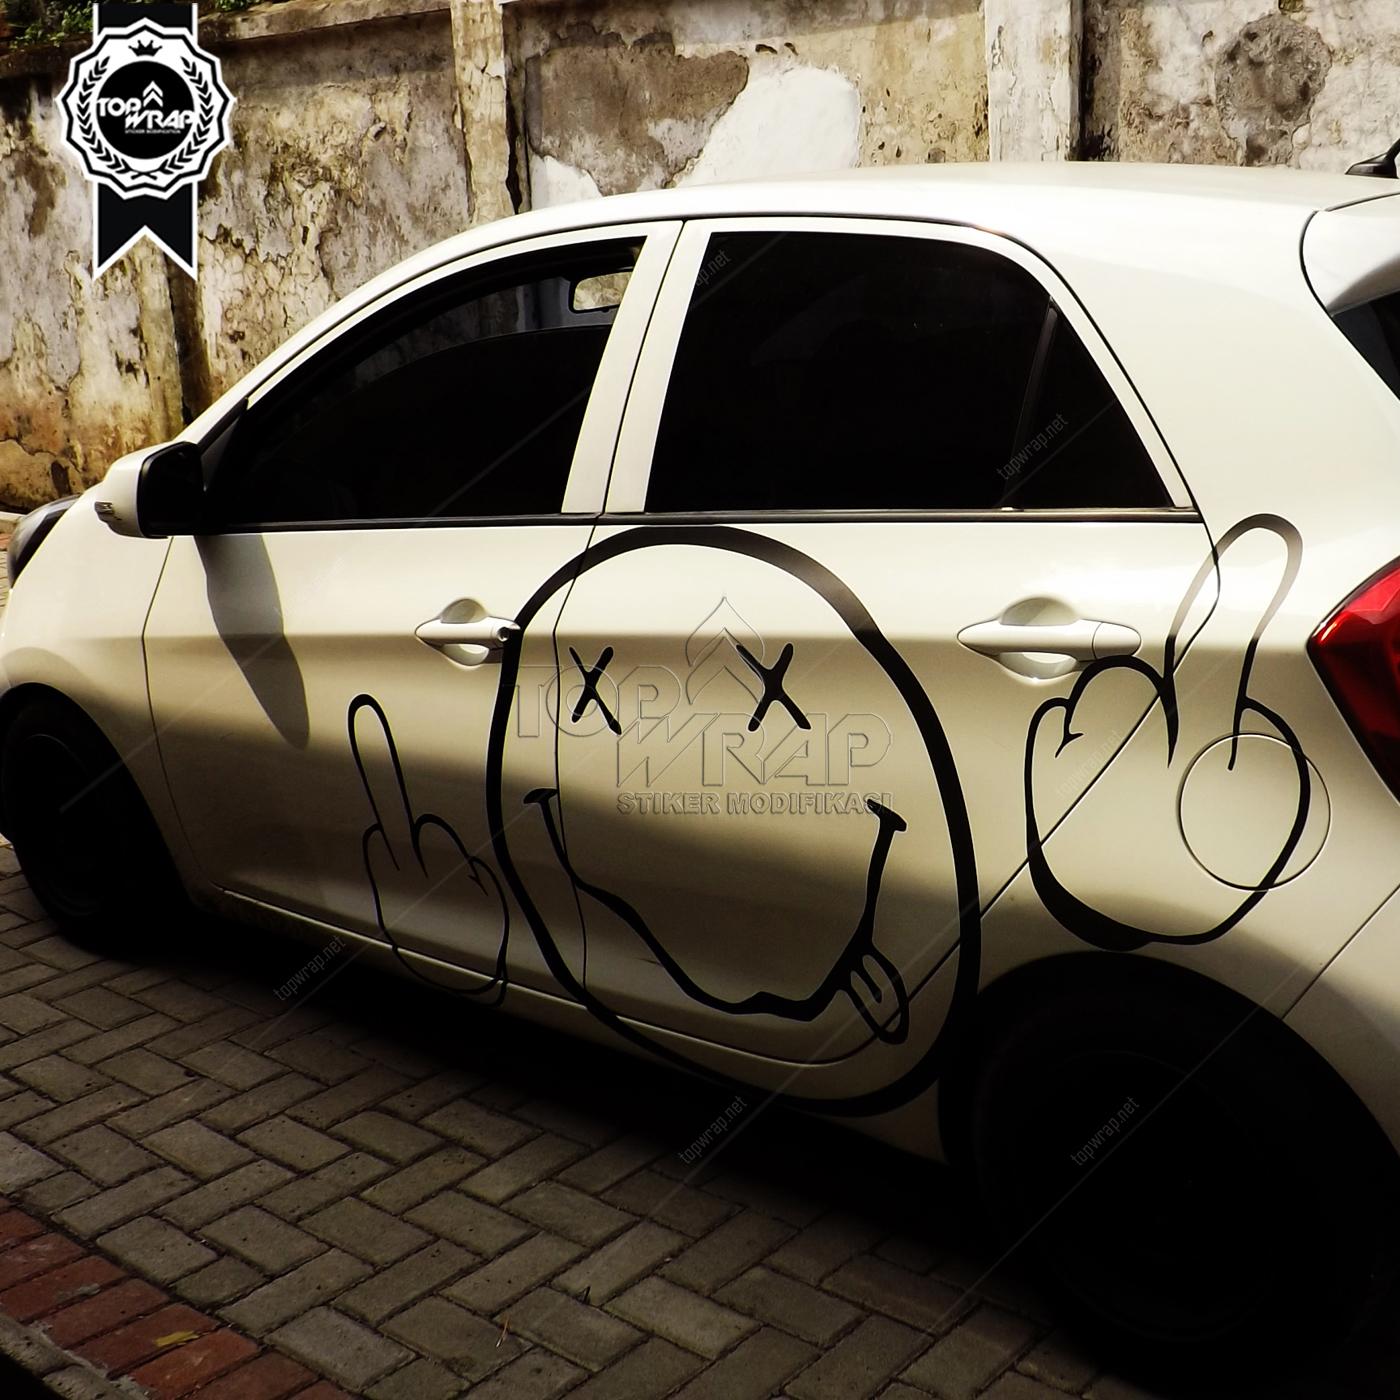 STIKER KACA: Stiker Karakter di Belakang Mobil